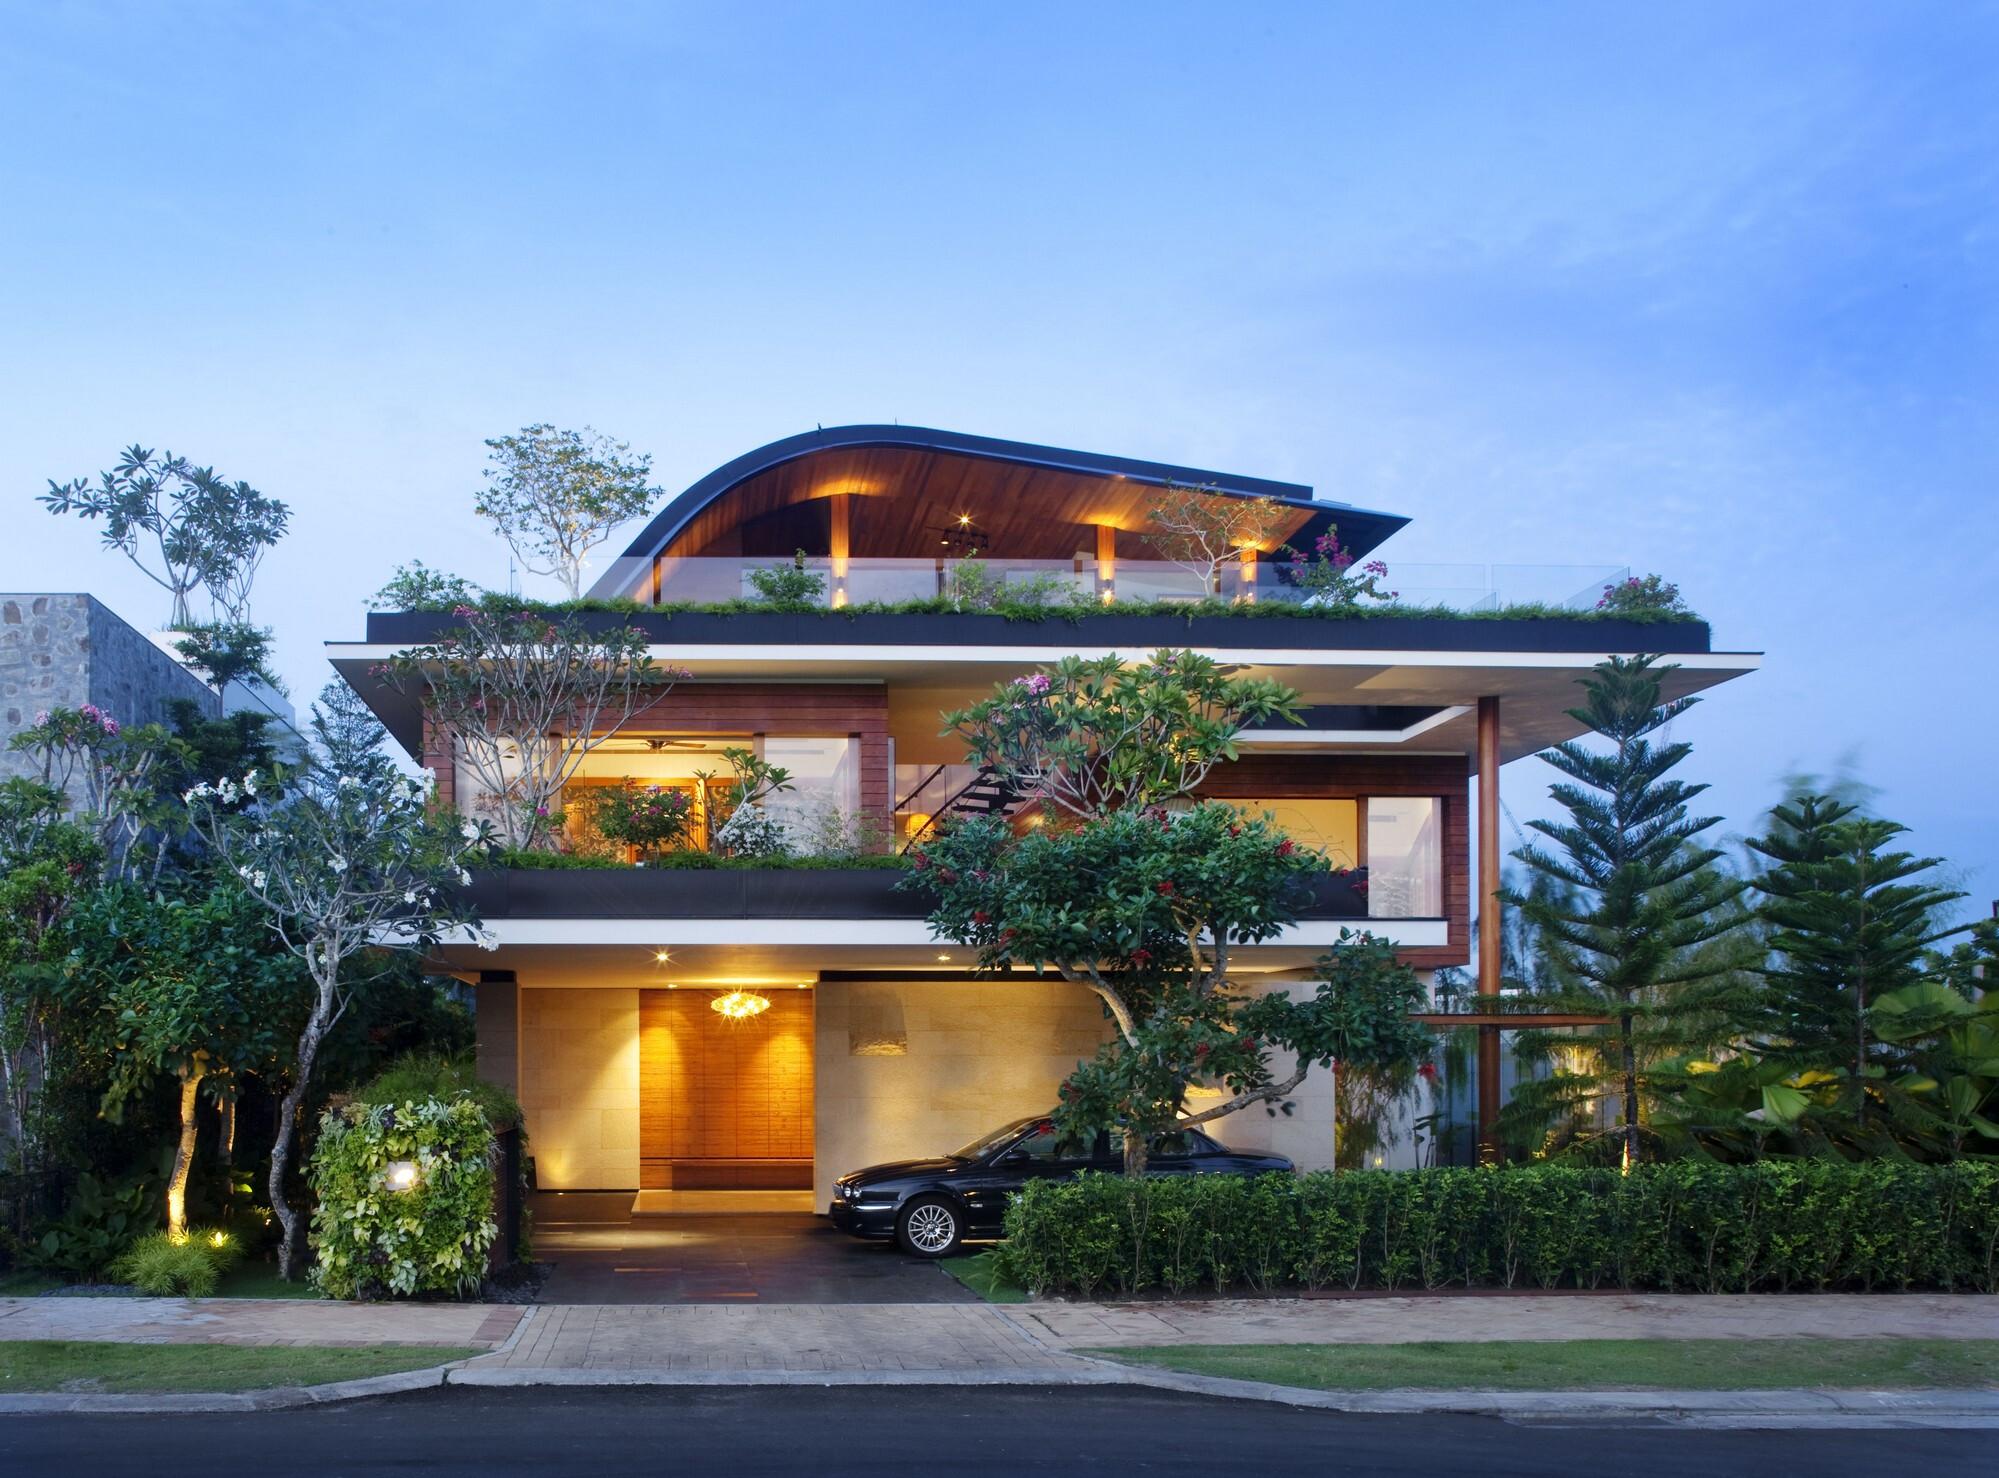 SKY GARDEN HOUSE (Meera House)